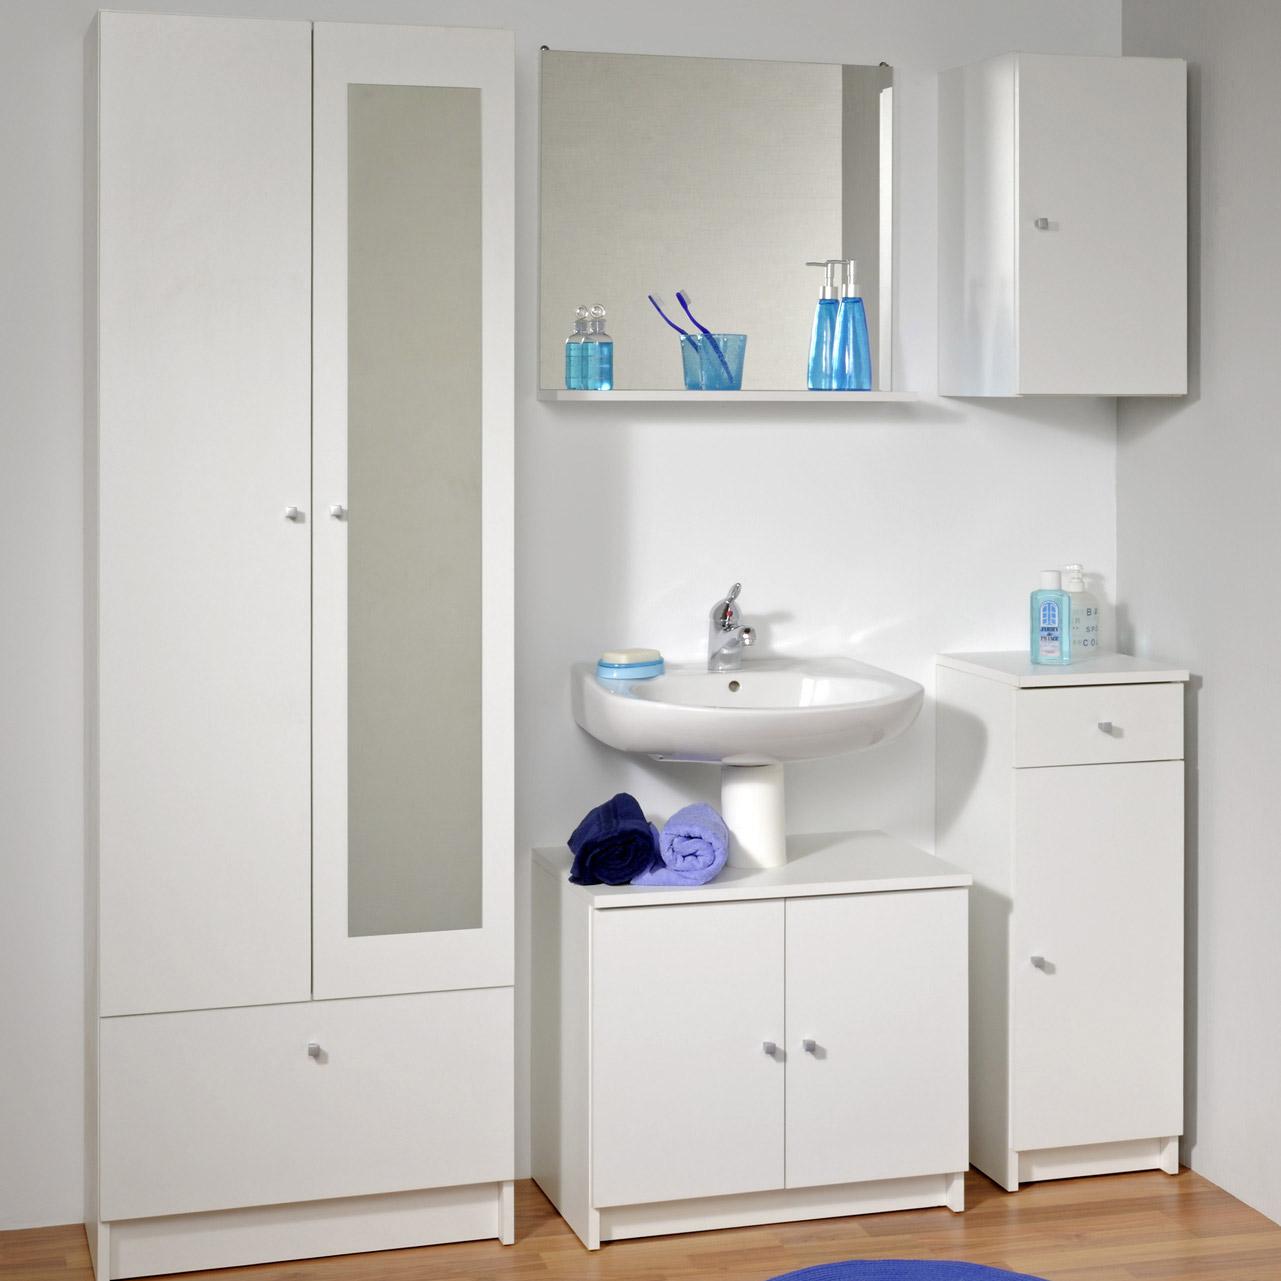 Meuble Haut Salle De Bain Avec Miroir meuble haut de salle de bain | bright shadow online